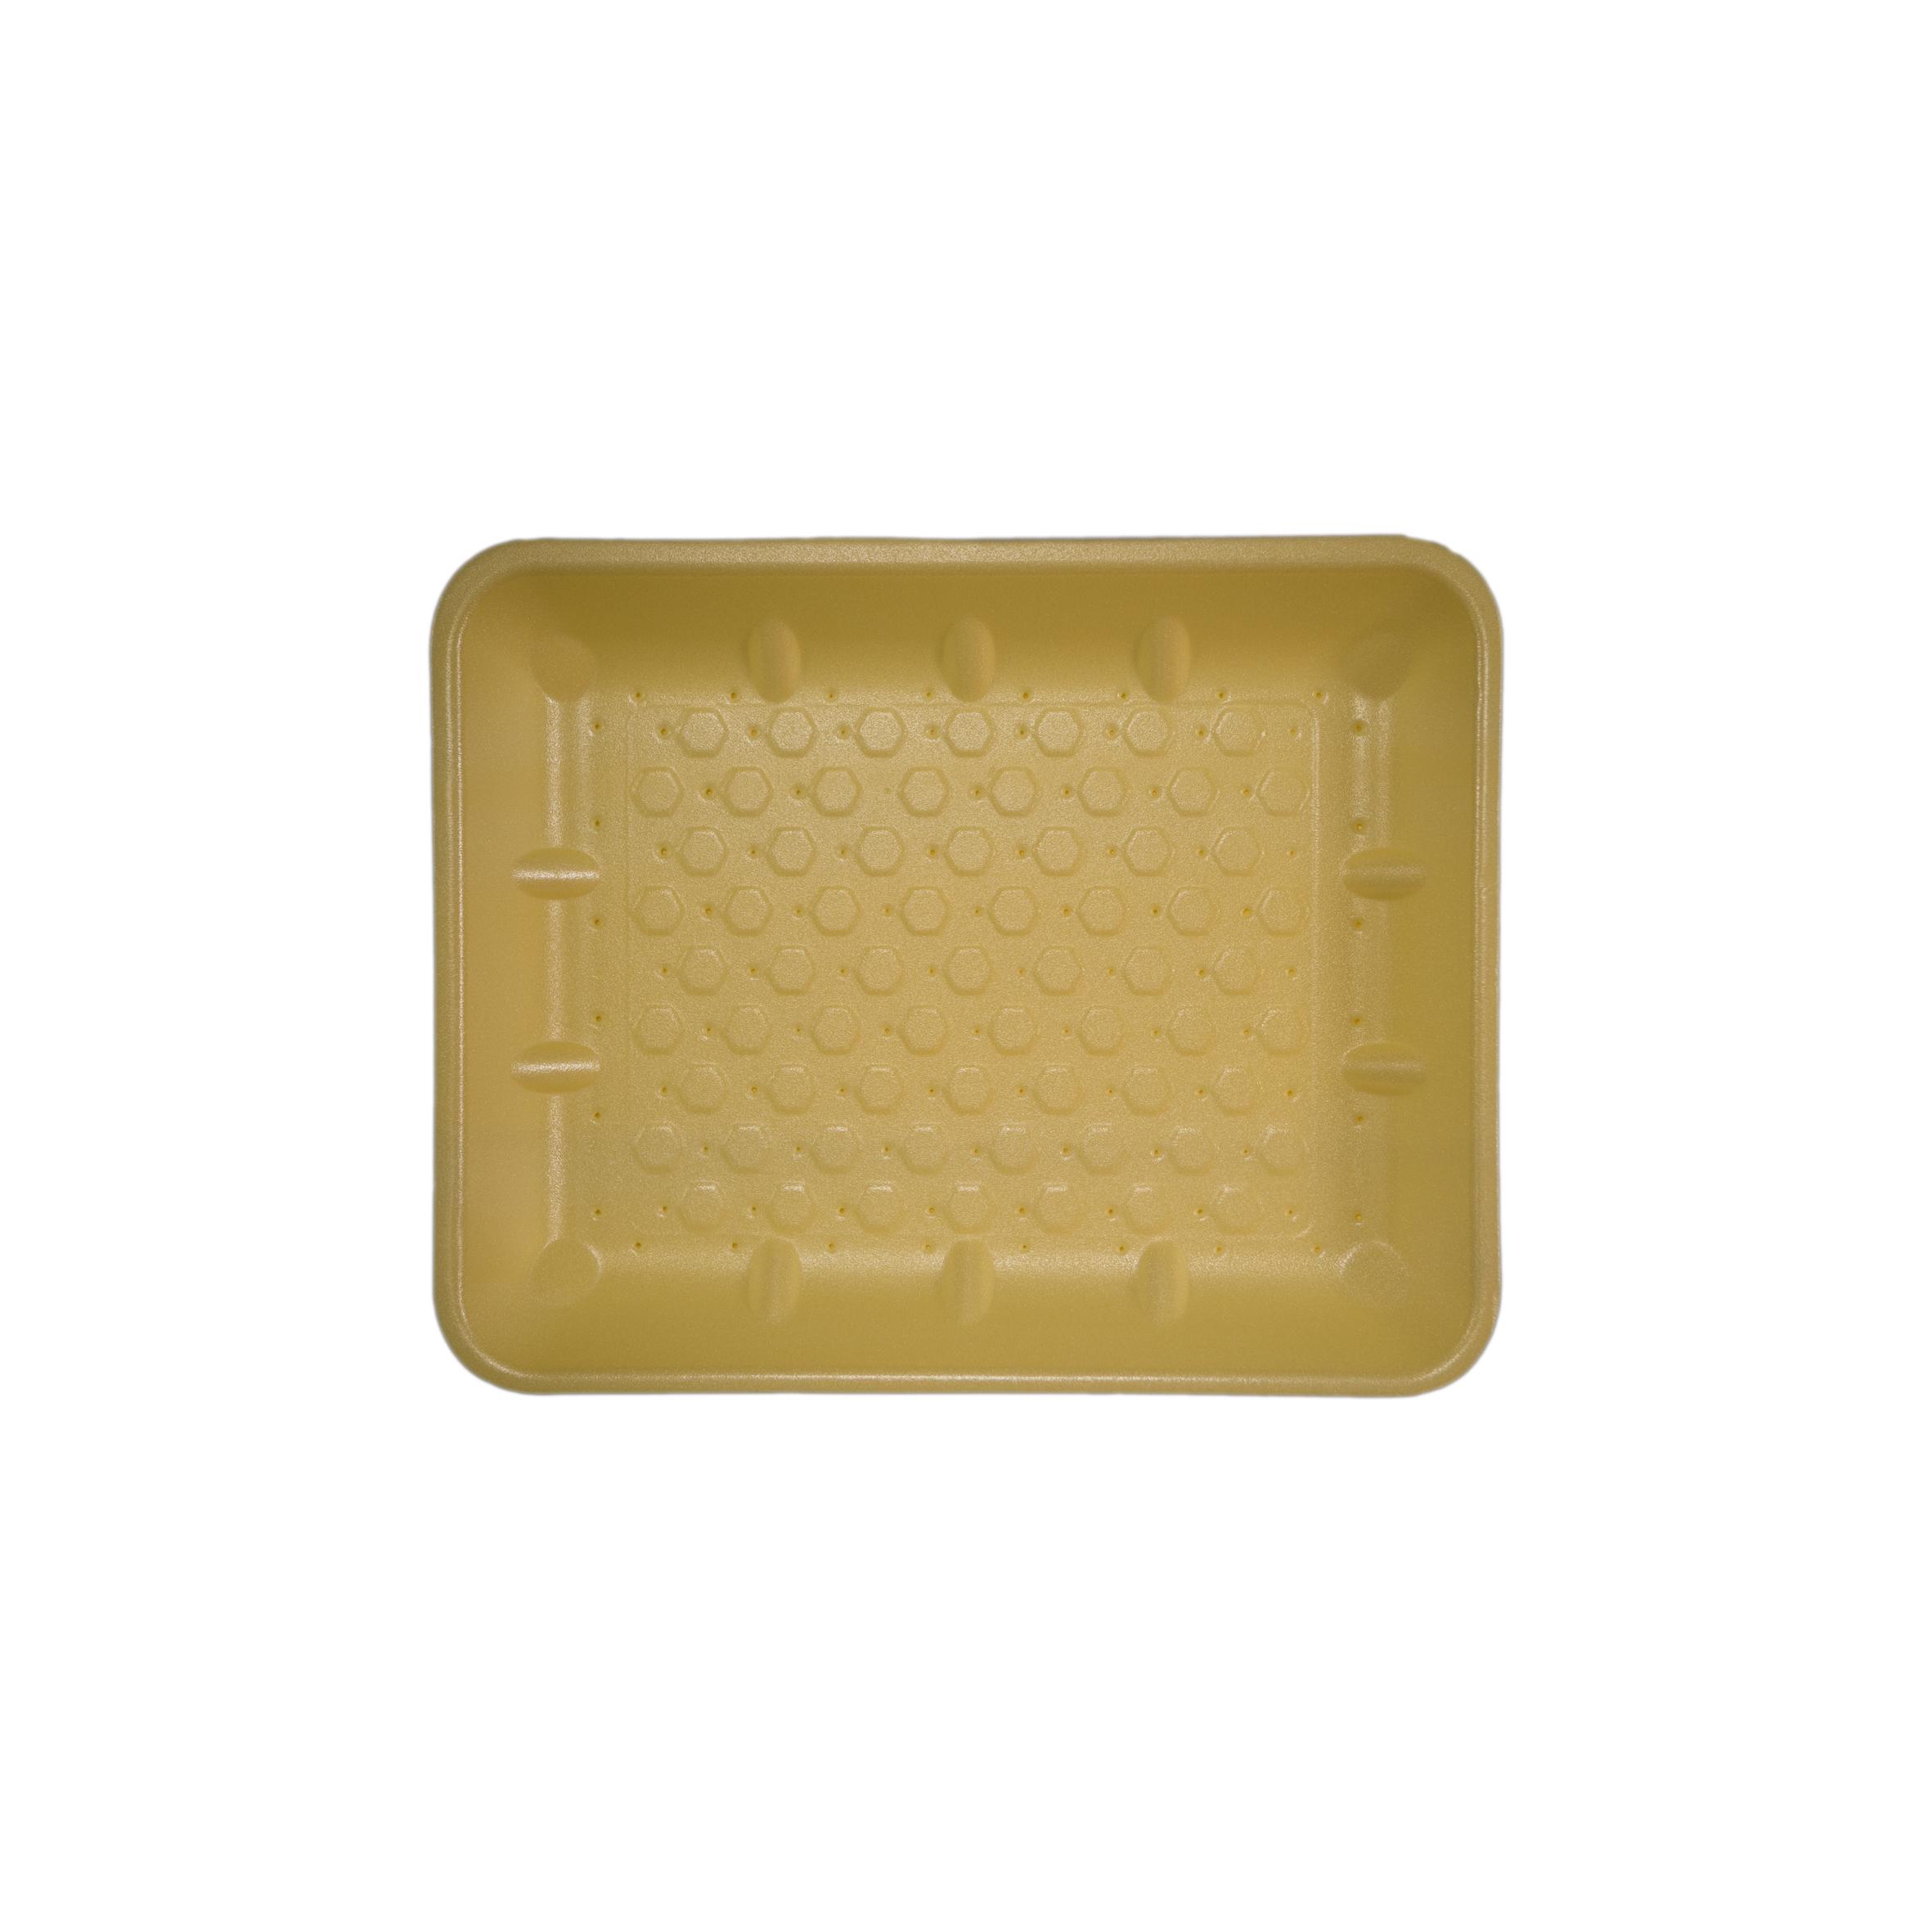 iK0117      OPEN CELL 35mm 11x9 yellow    90 per sleeve 360 per carton